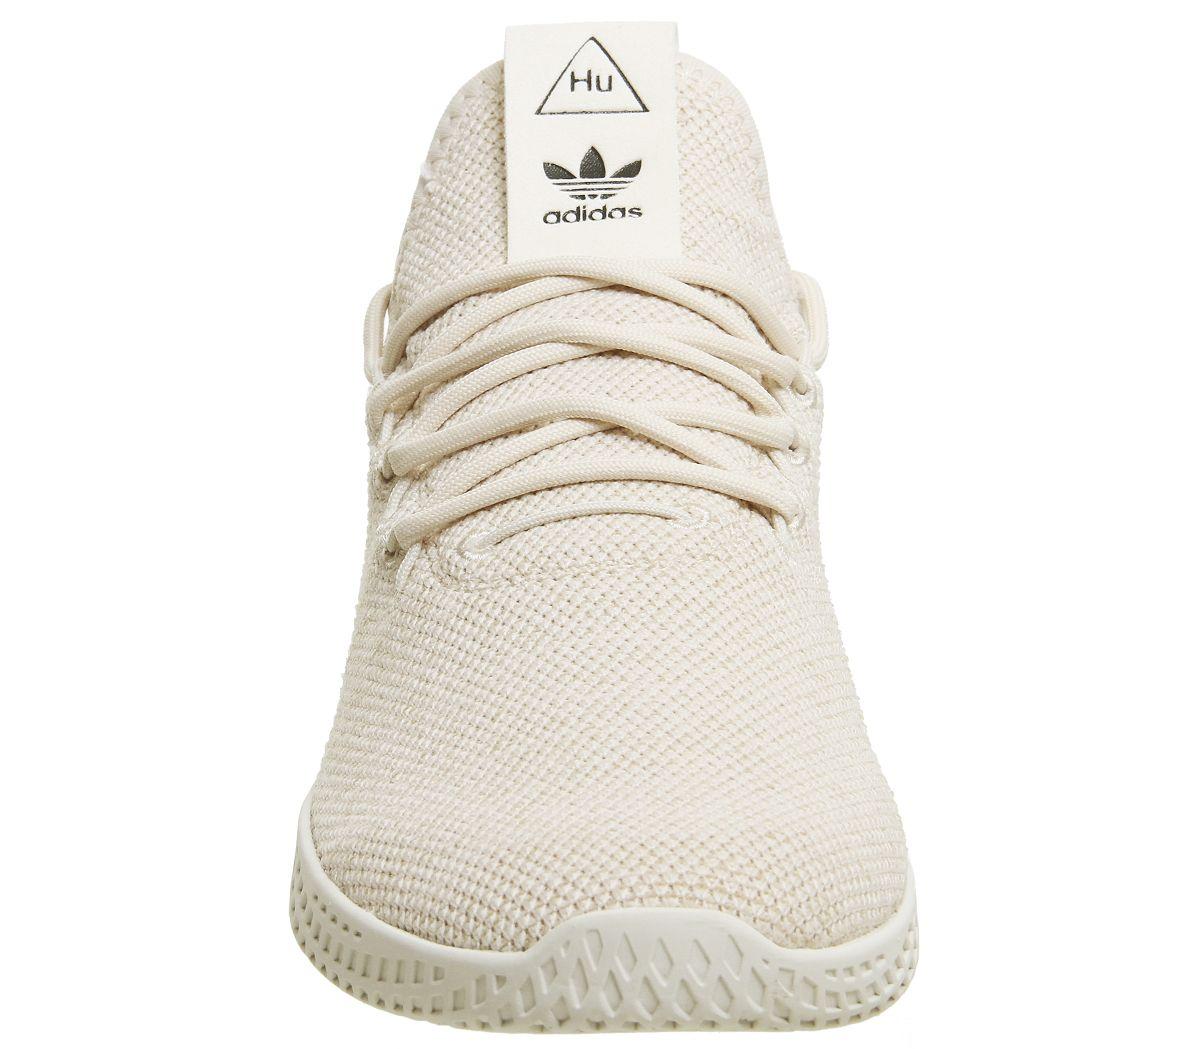 da01ebb118 Details about Mens Adidas Pw Tennis Trainers Linen Chalk White Trainers  Shoes